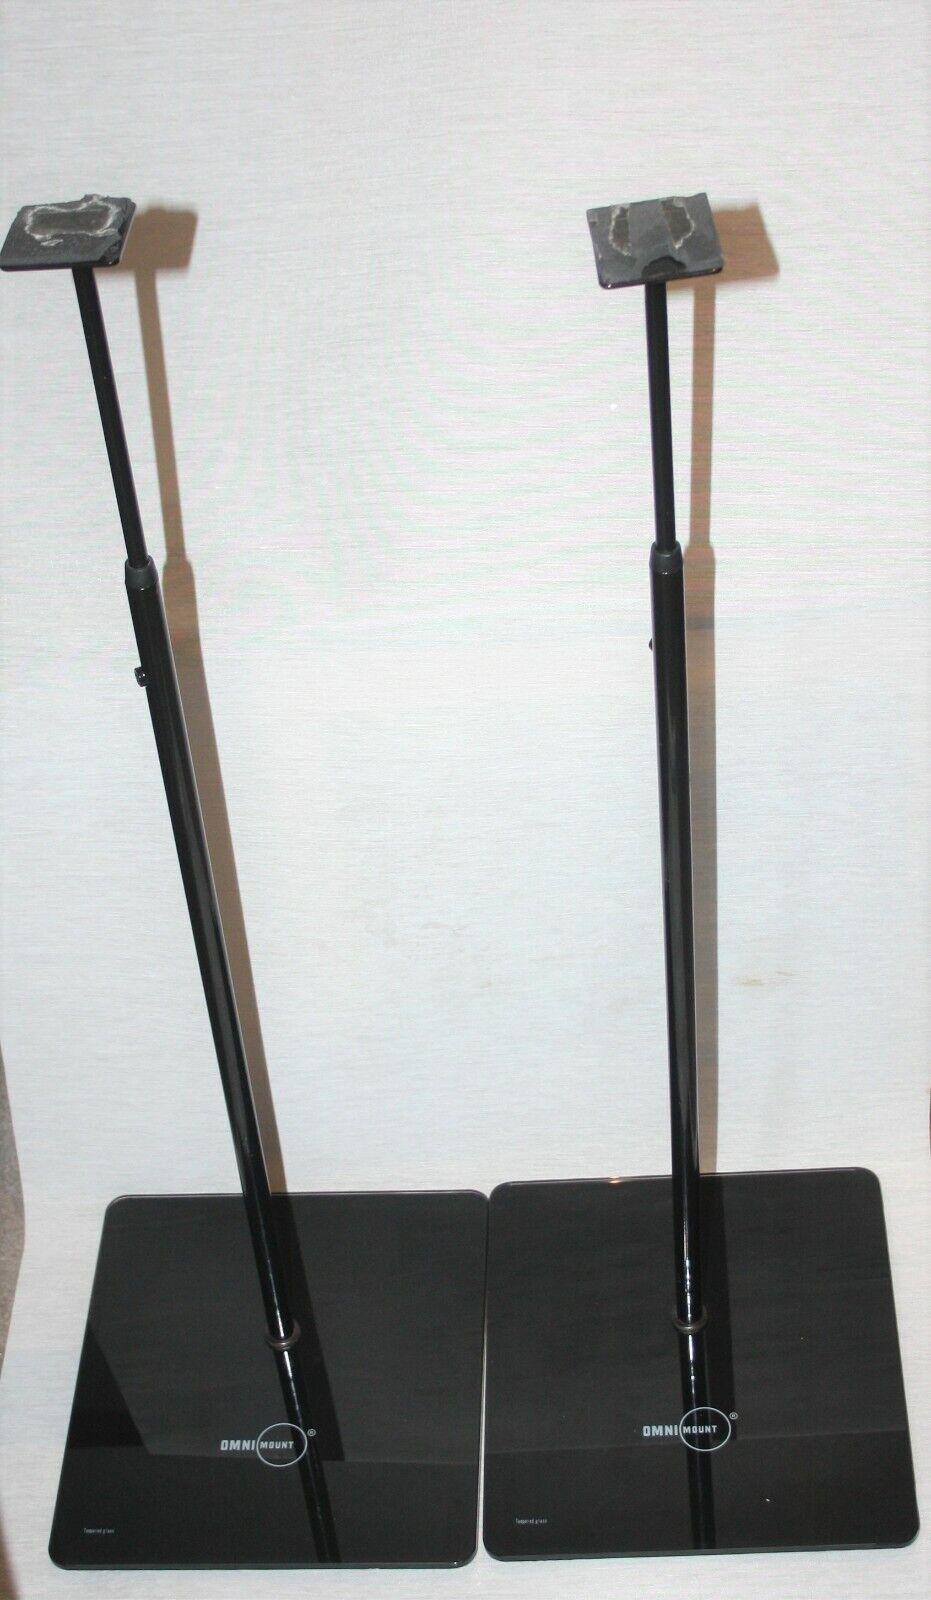 OmniMount EL0 Small Satellite Speaker Stands - Universal - (Pair)